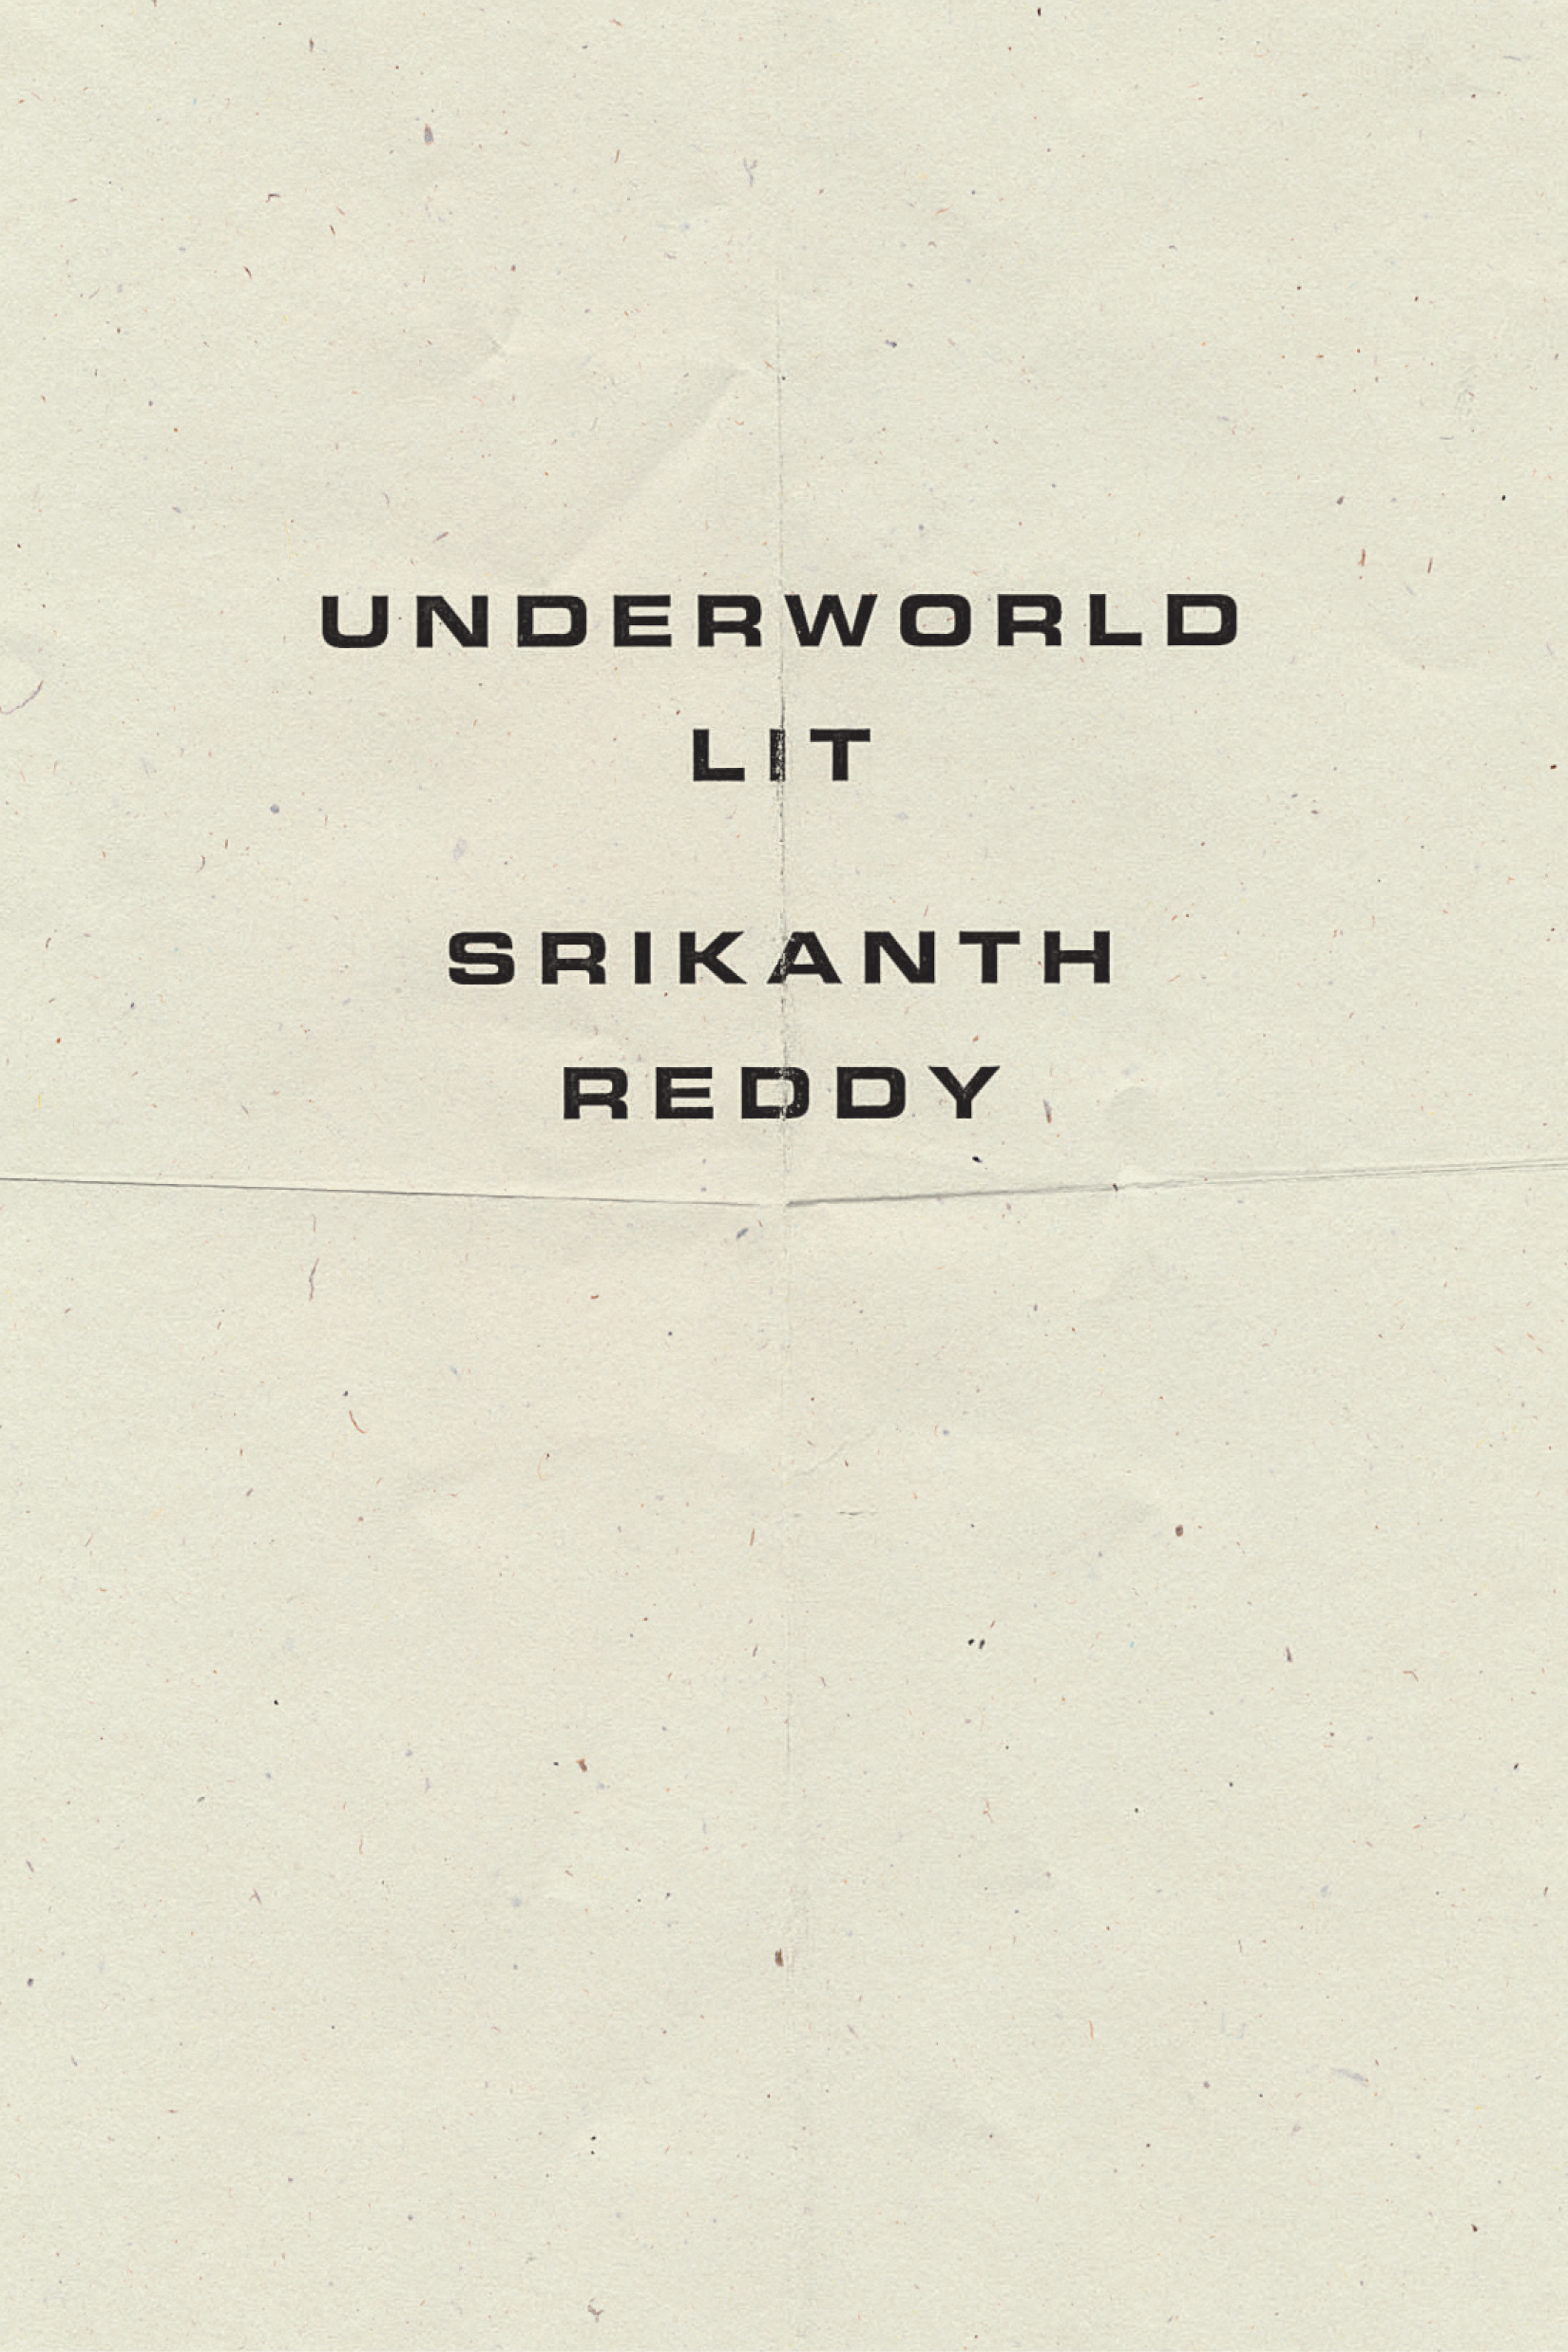 Underworld Lit by Srikanth Reddy | Wave Books, 2020